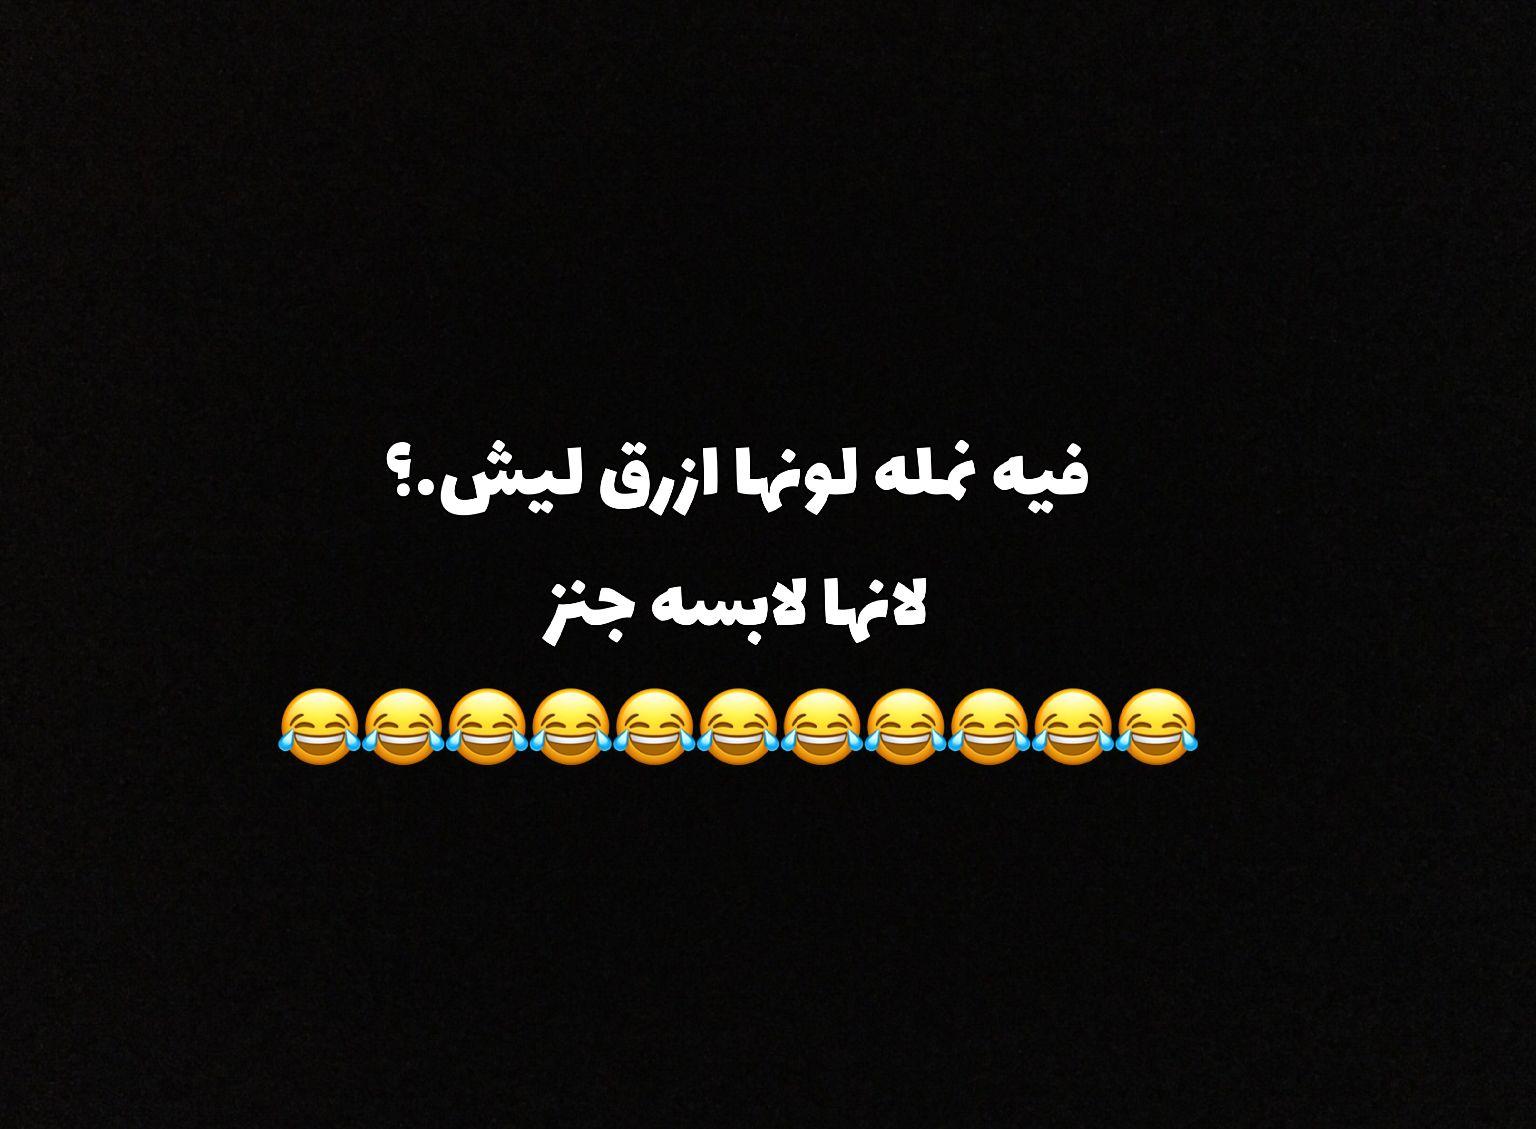 تخيلو الجنز كيف راح يكون حجمه Funny Words Funny Arabic Quotes Arabic Jokes